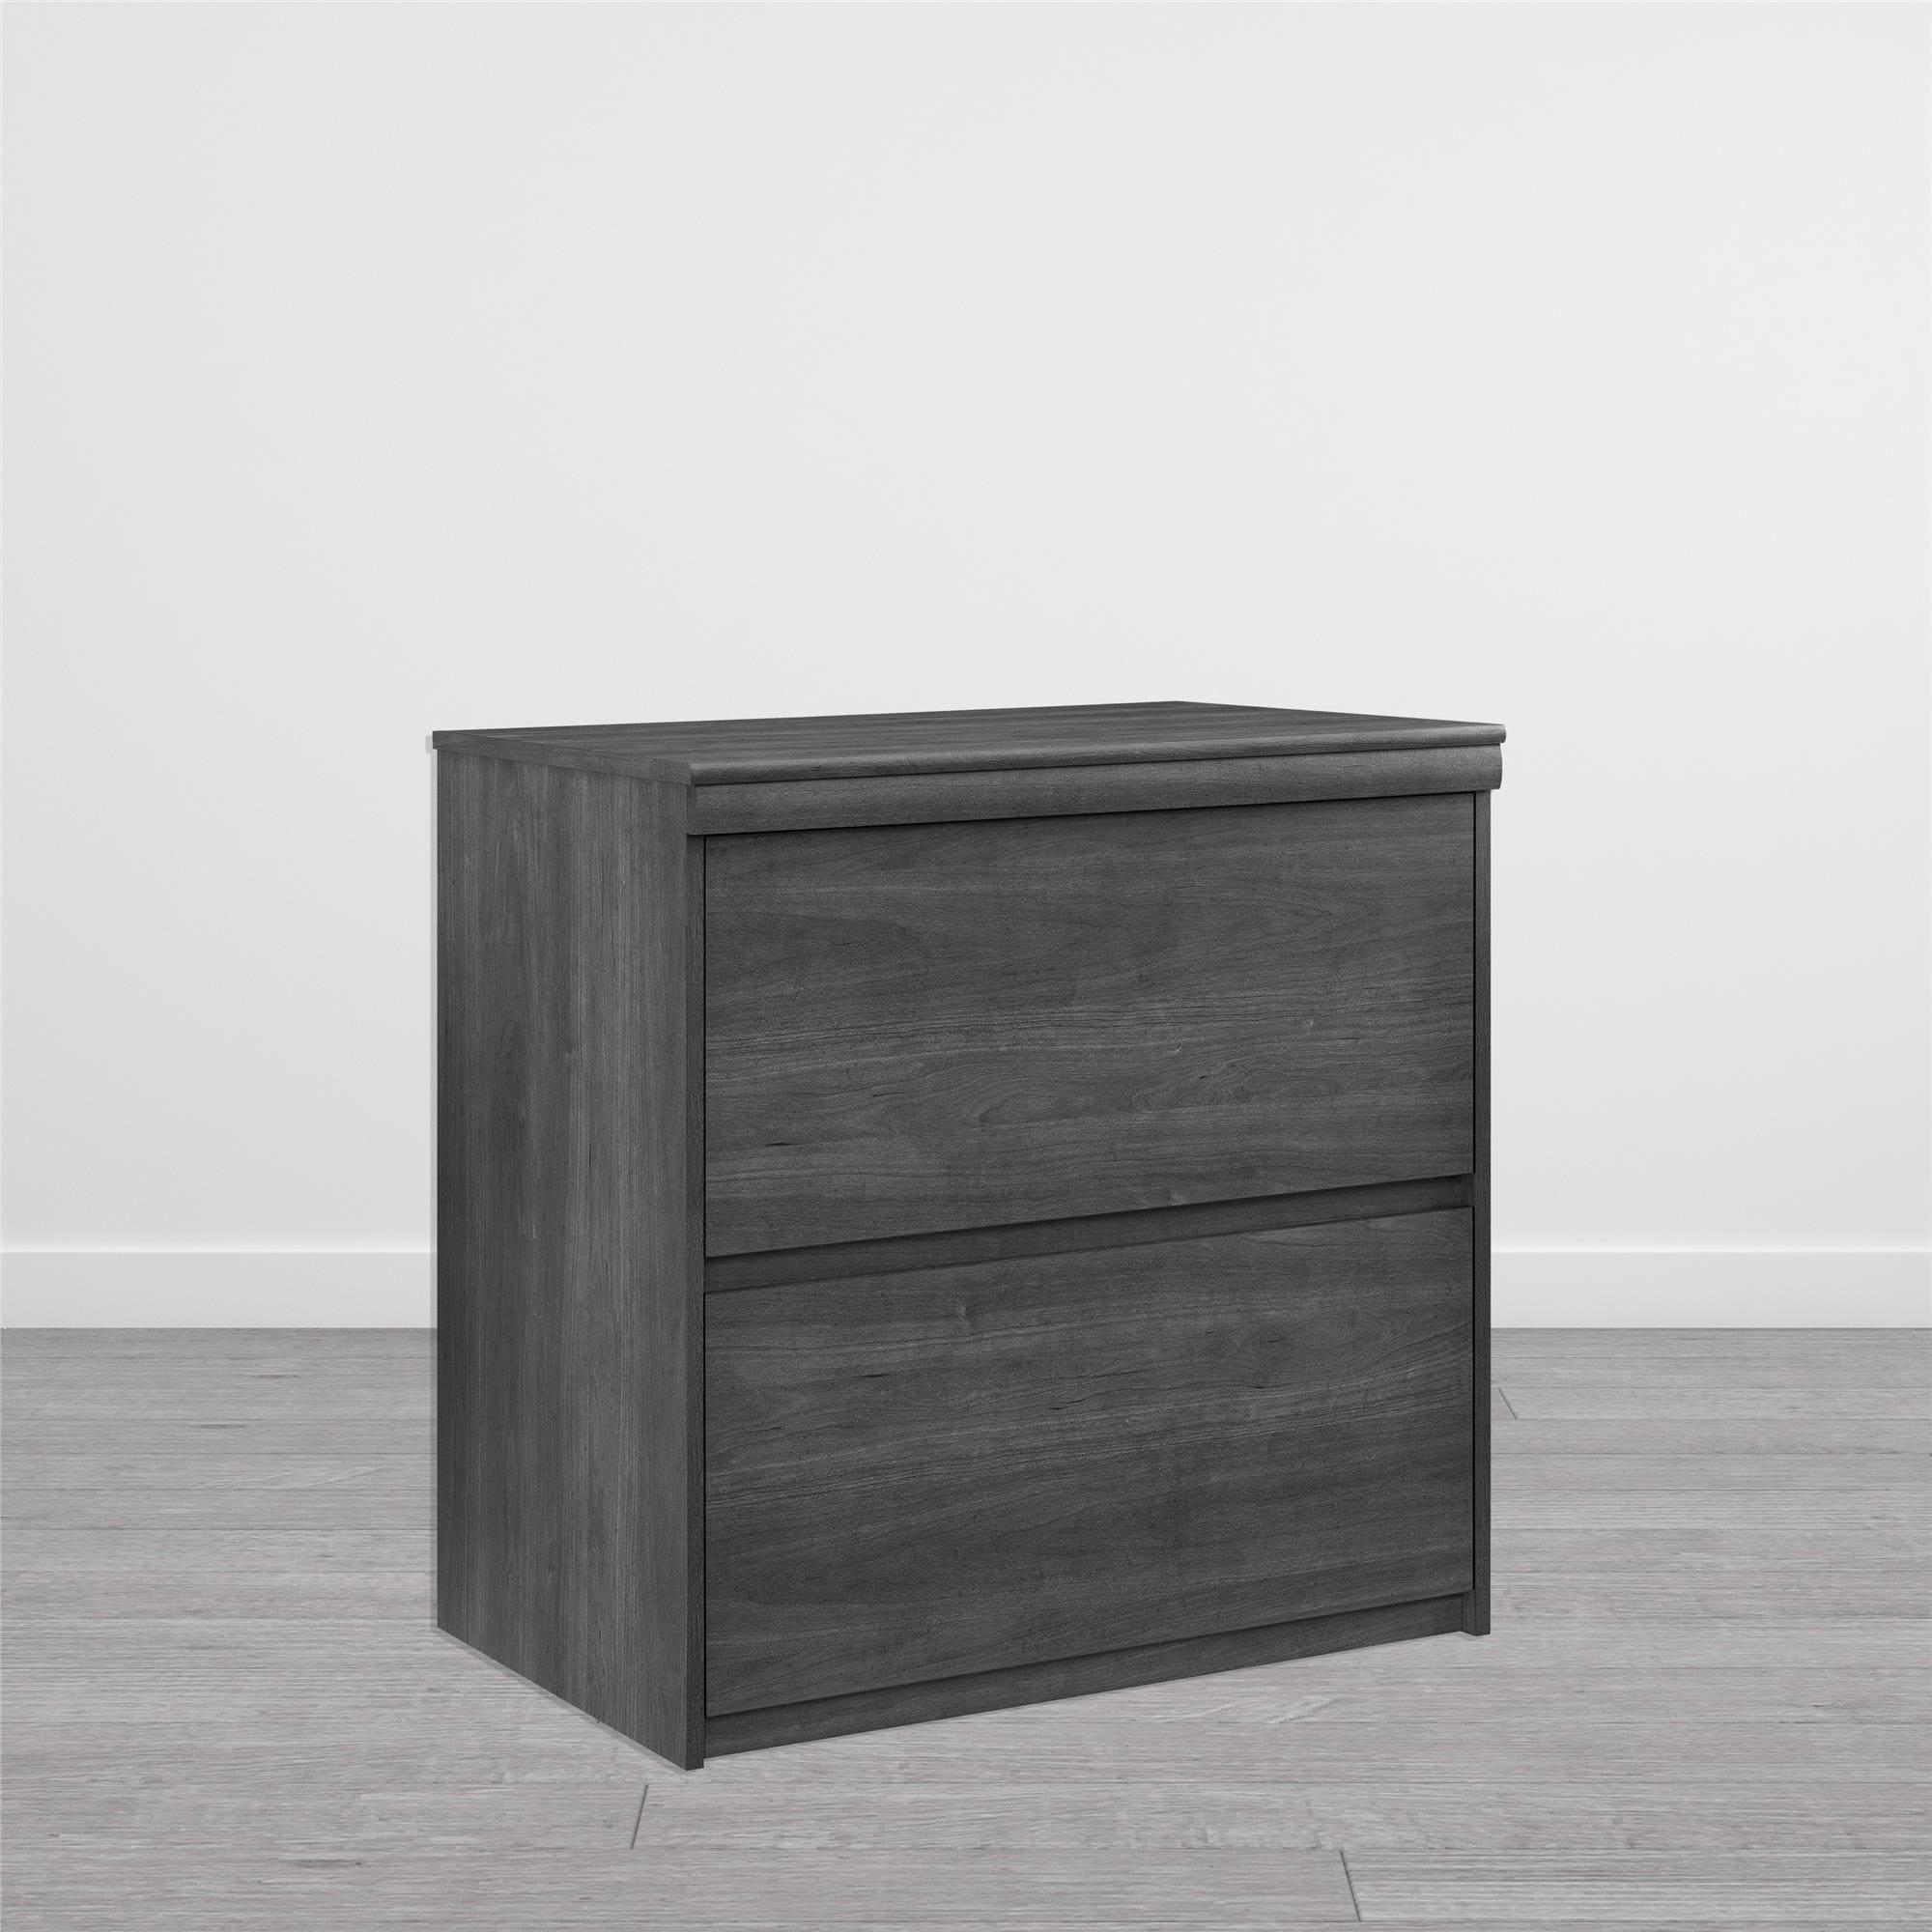 Buy Grey Filing Cabinets U0026 File Storage Online At Overstock.com | Our Best  Home Office Furniture Deals